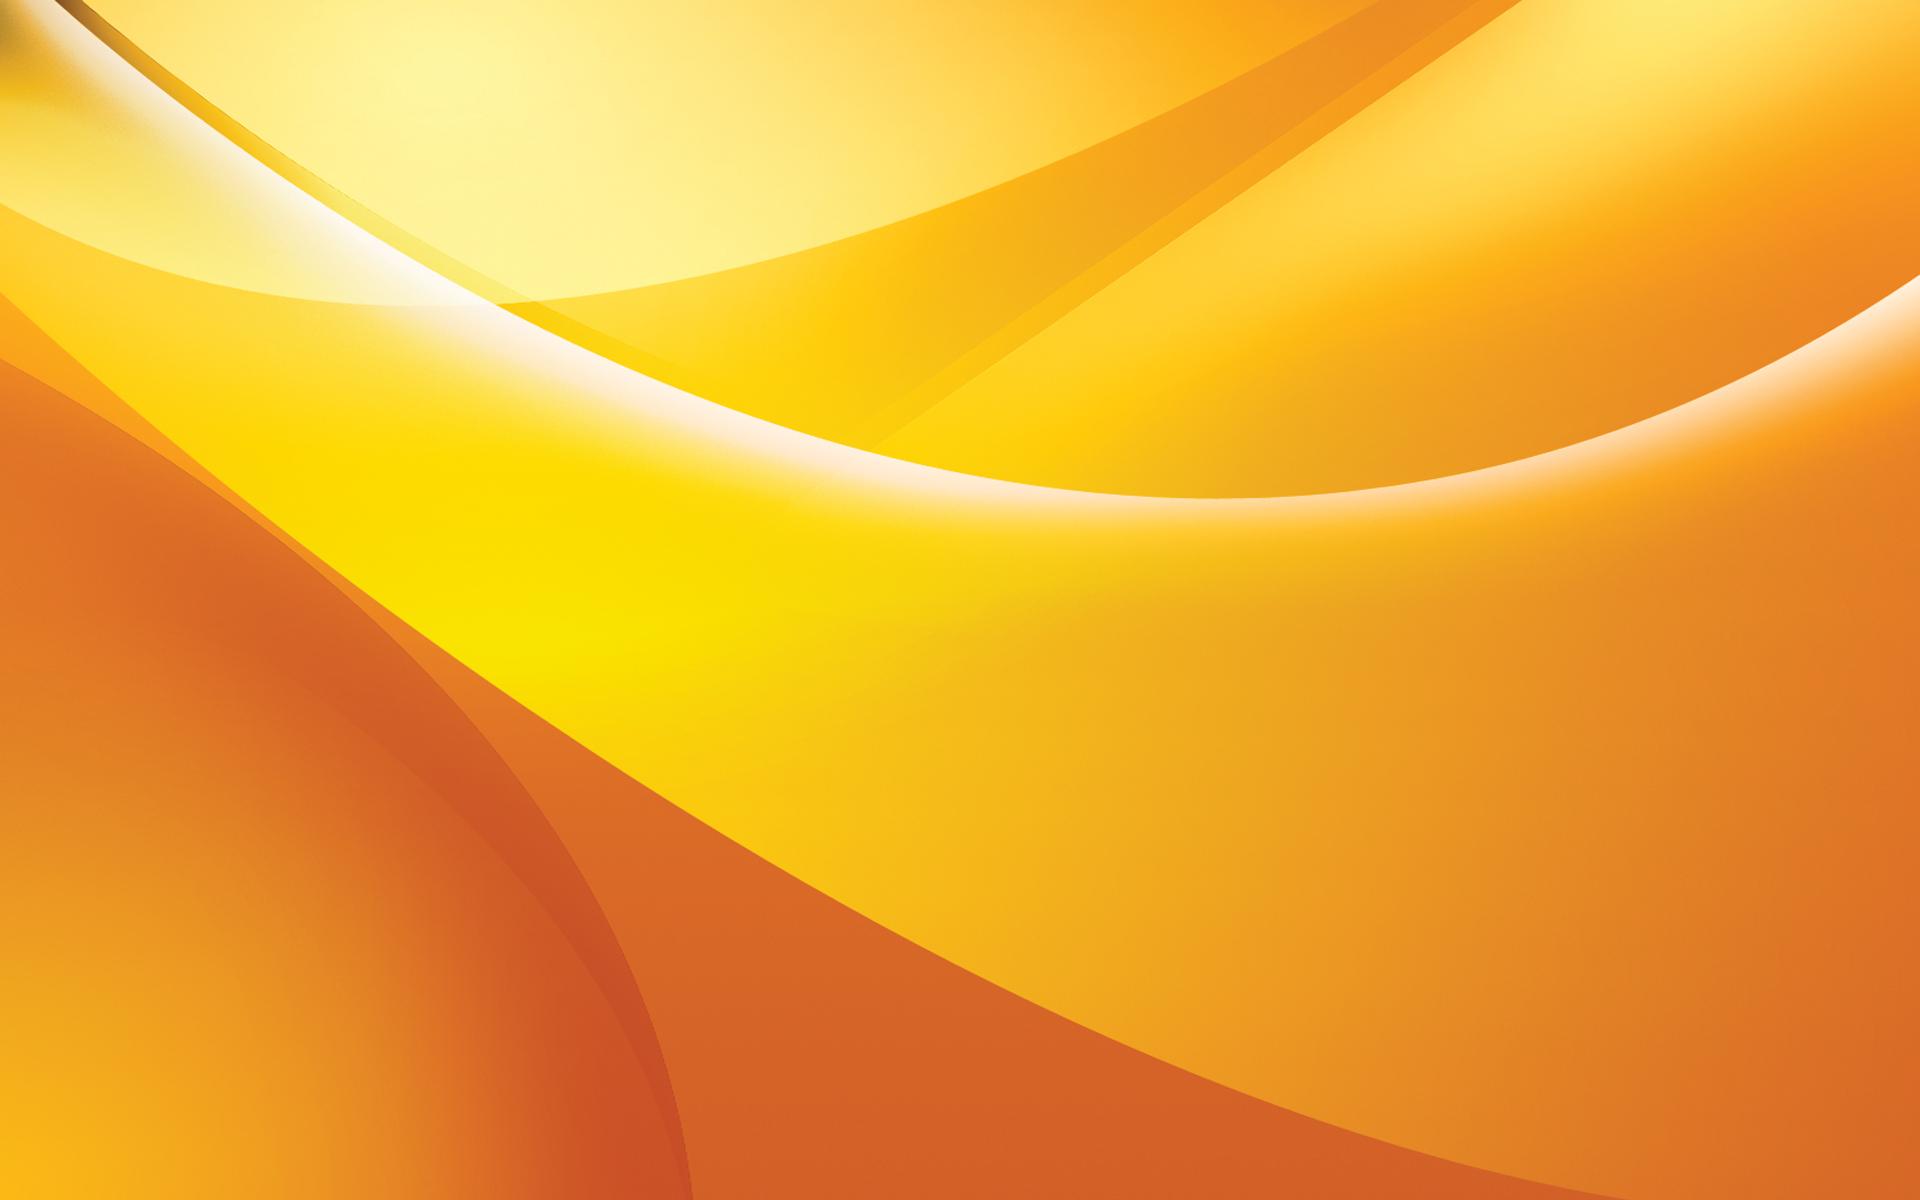 Orange Orange Wallpaper